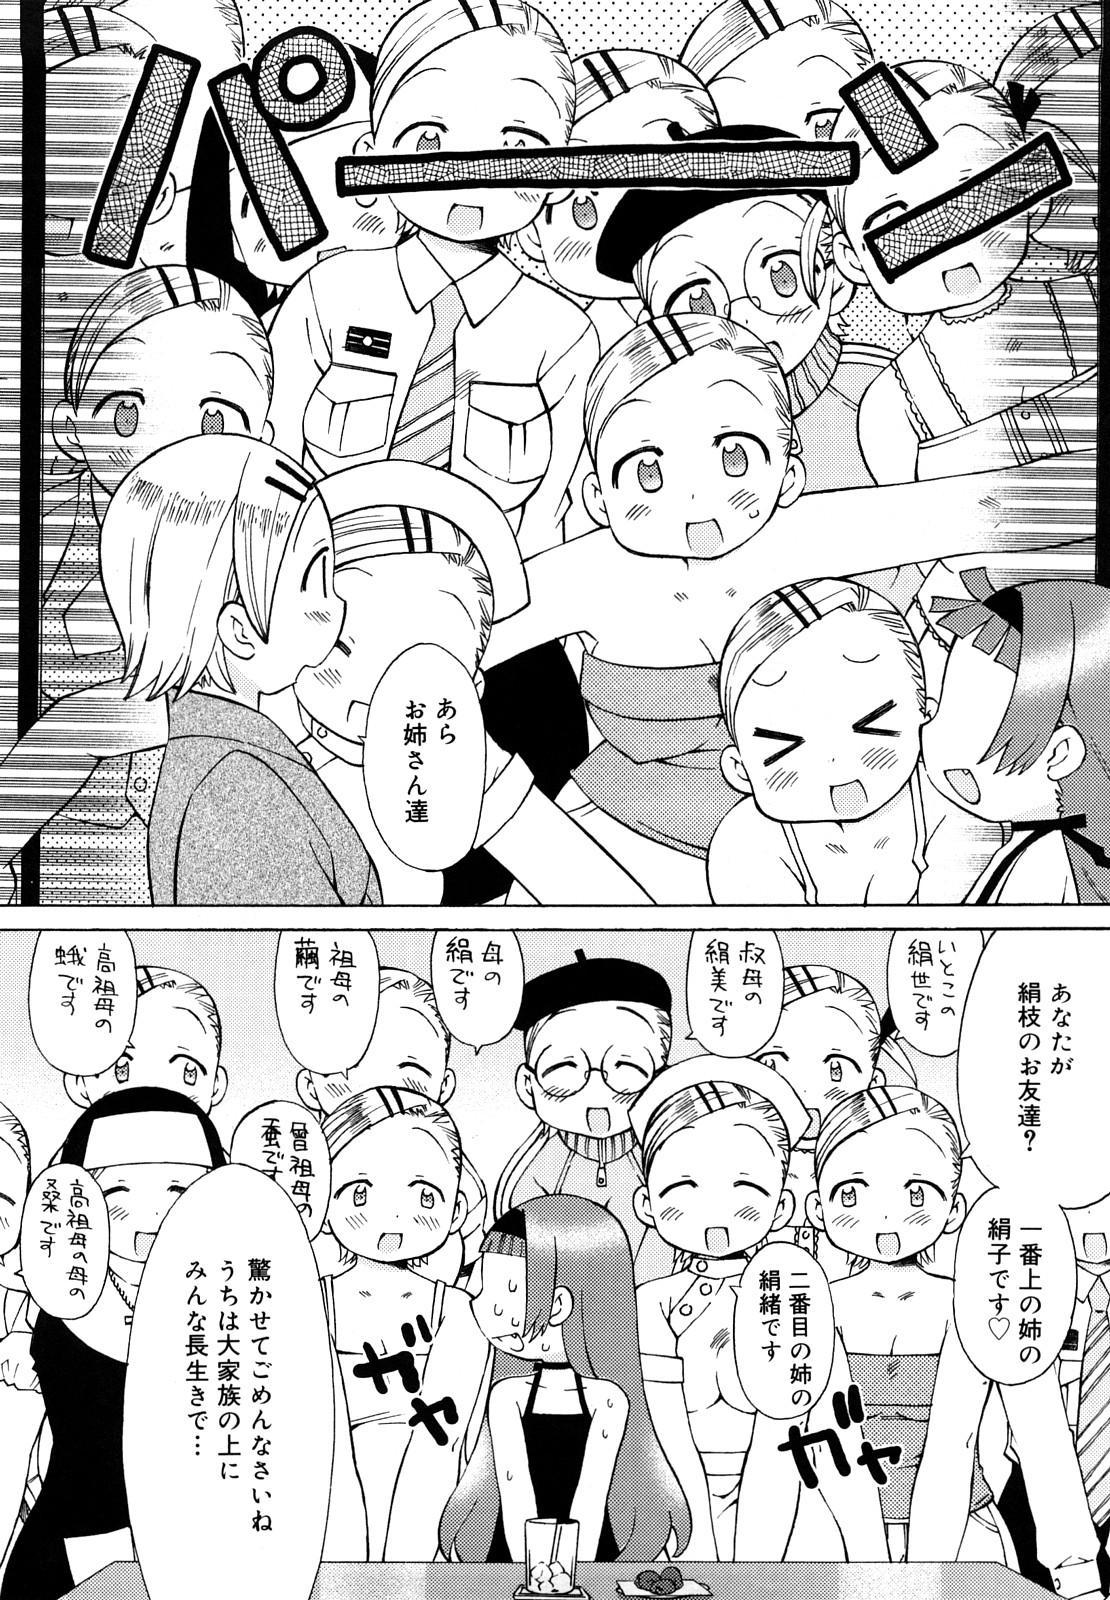 Hatsuden Pandakun! Shinsouban 198